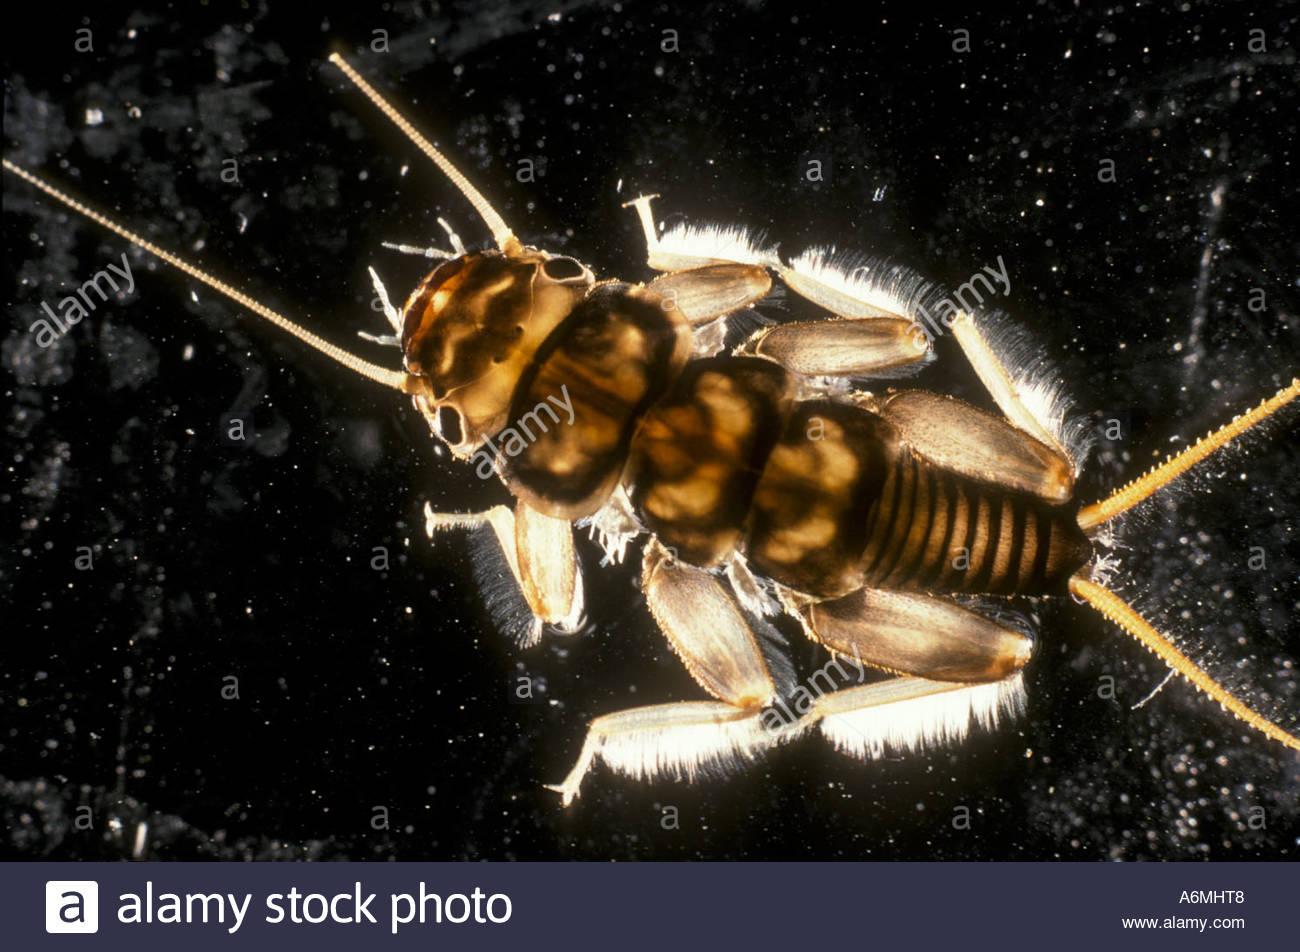 Stonefly nymph larva plecoptera aquatic insect - Stock Image